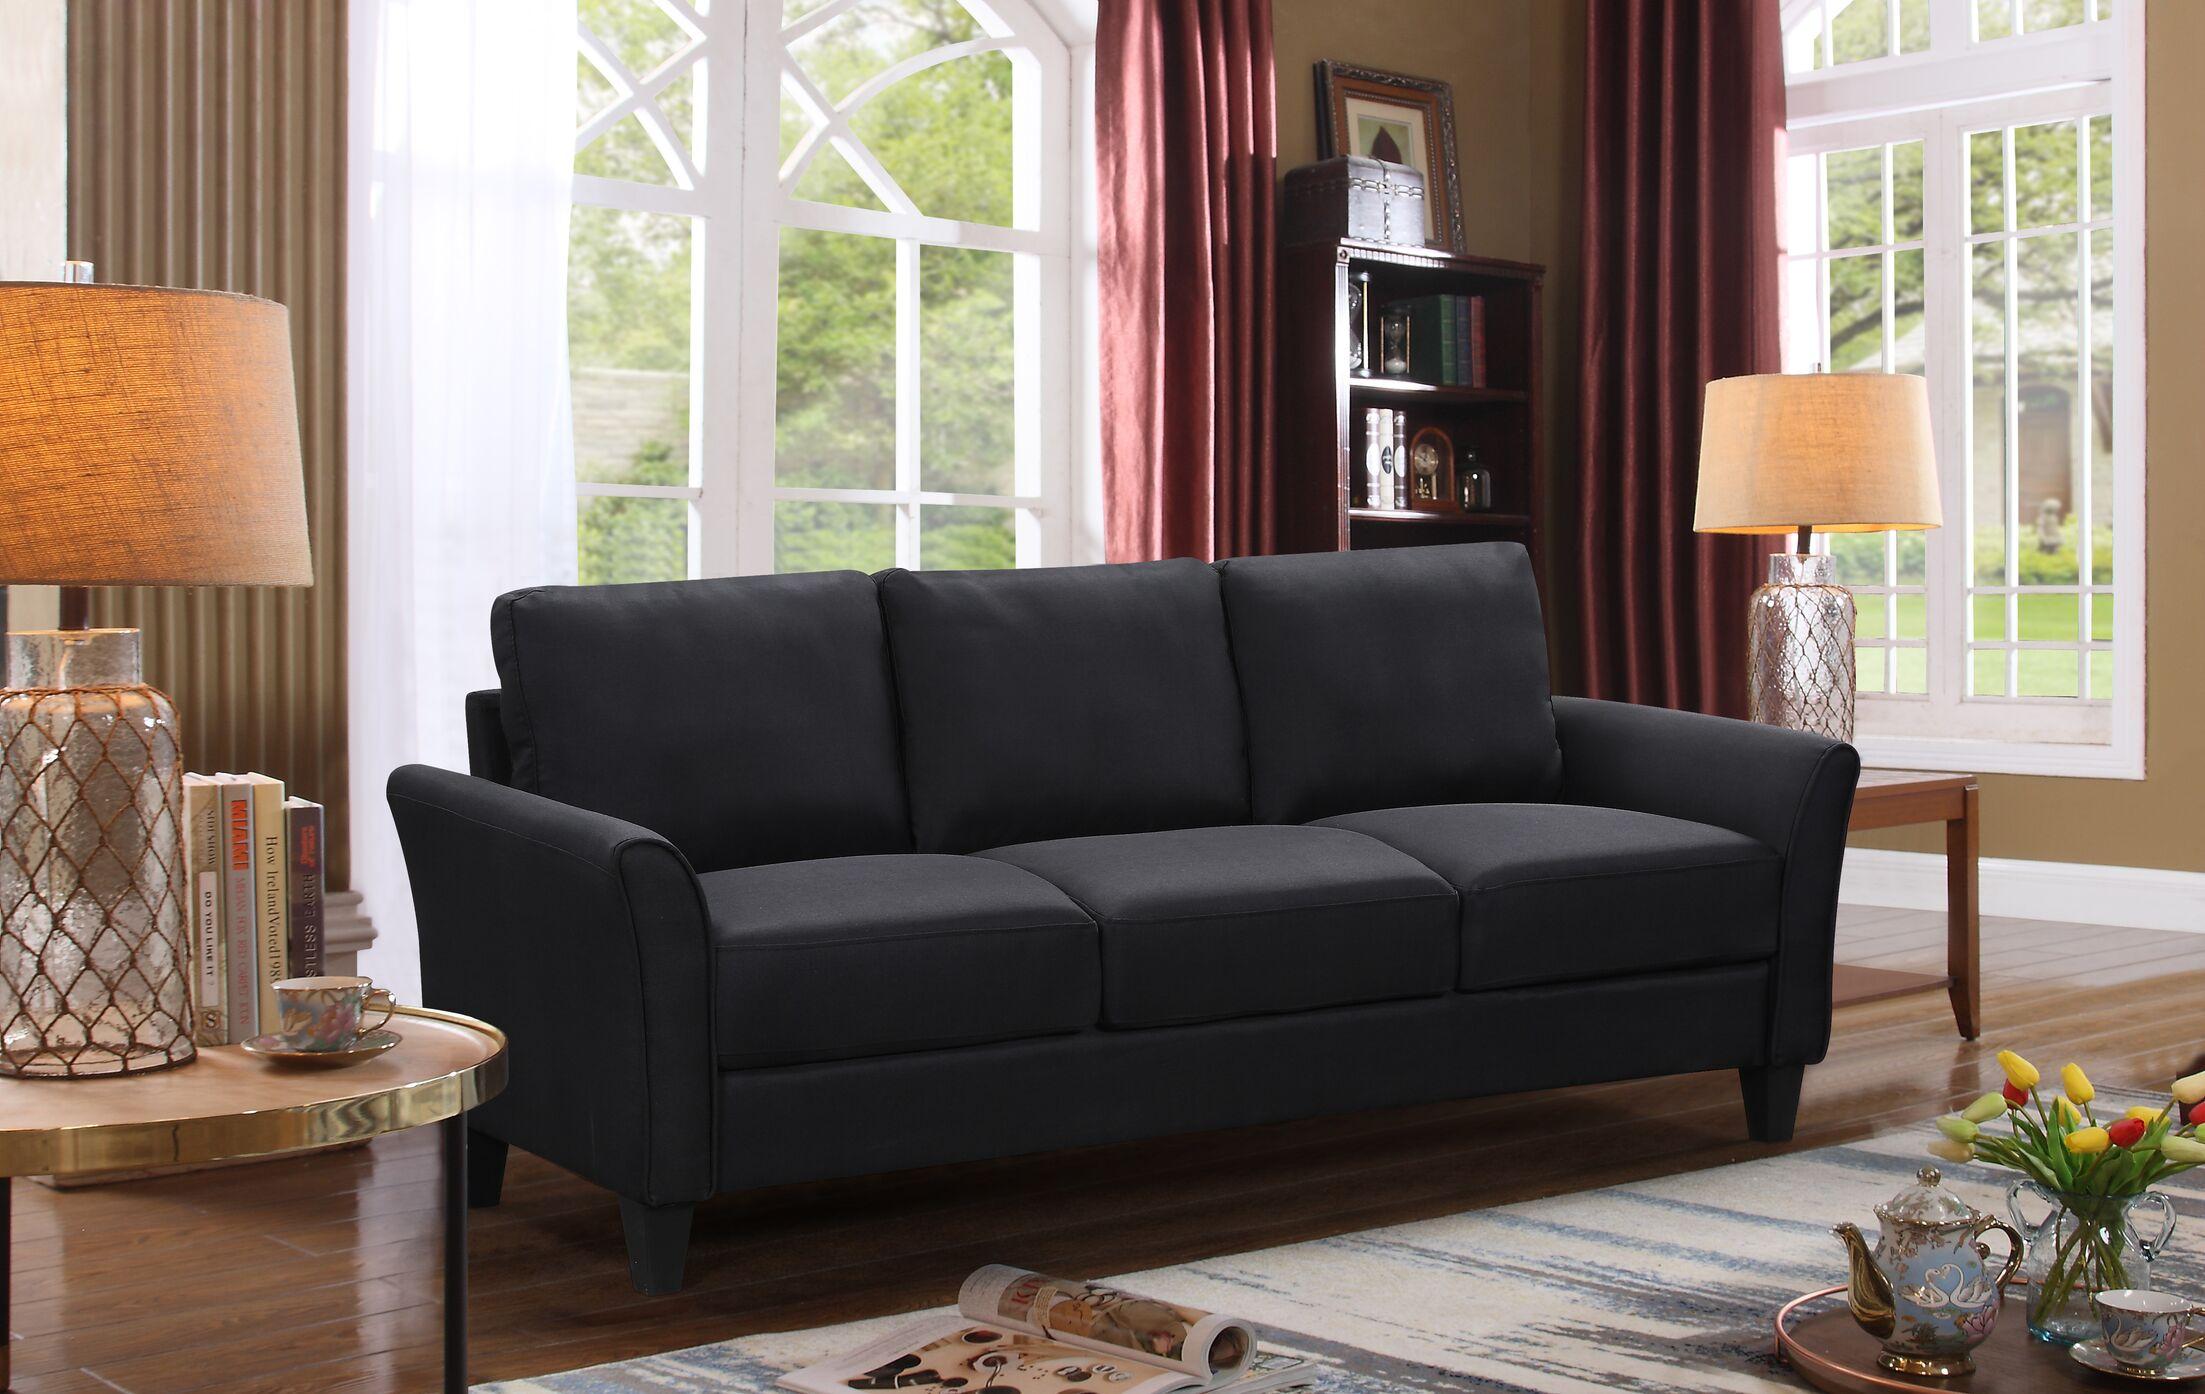 Mcnew Arm Sofa Upholstery: Black